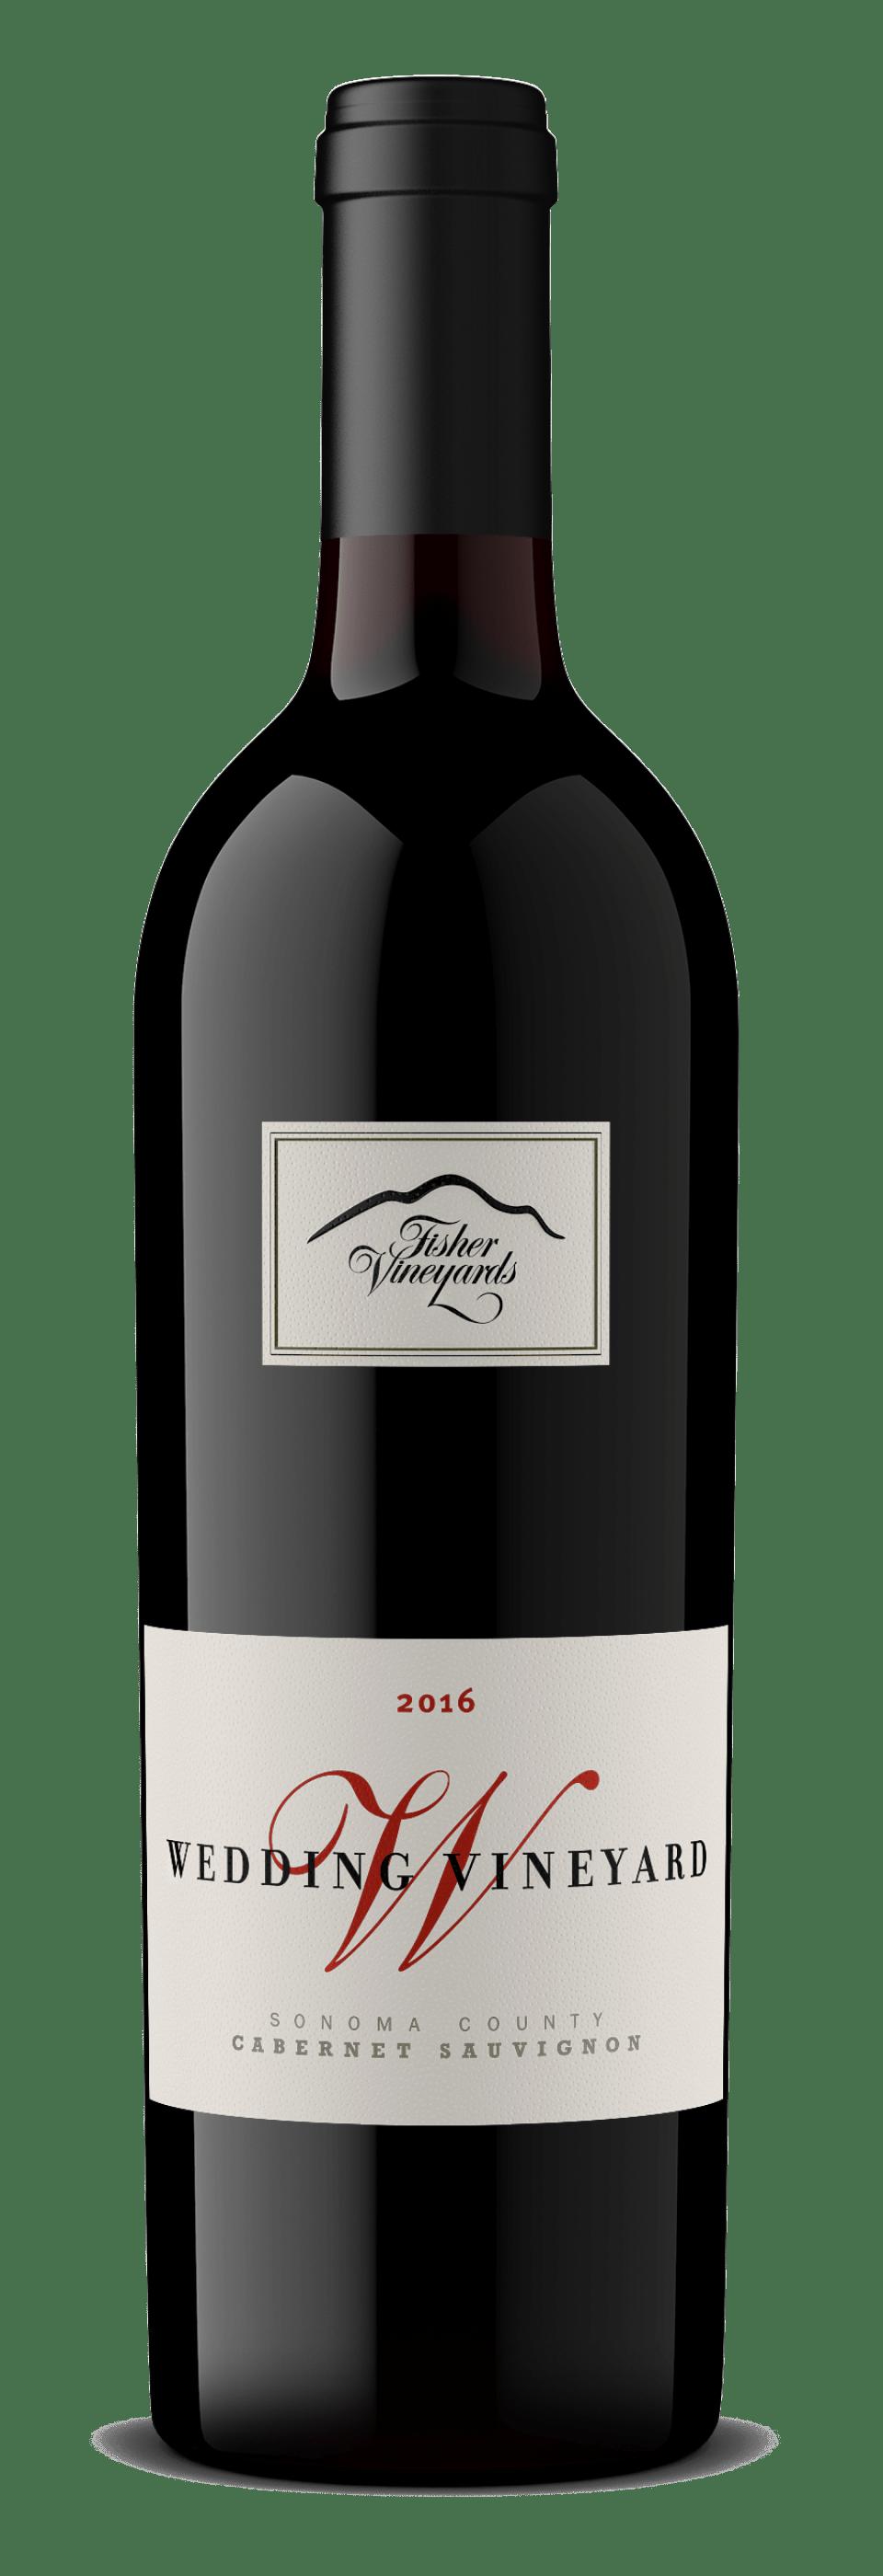 2016 Wedding Vineyard